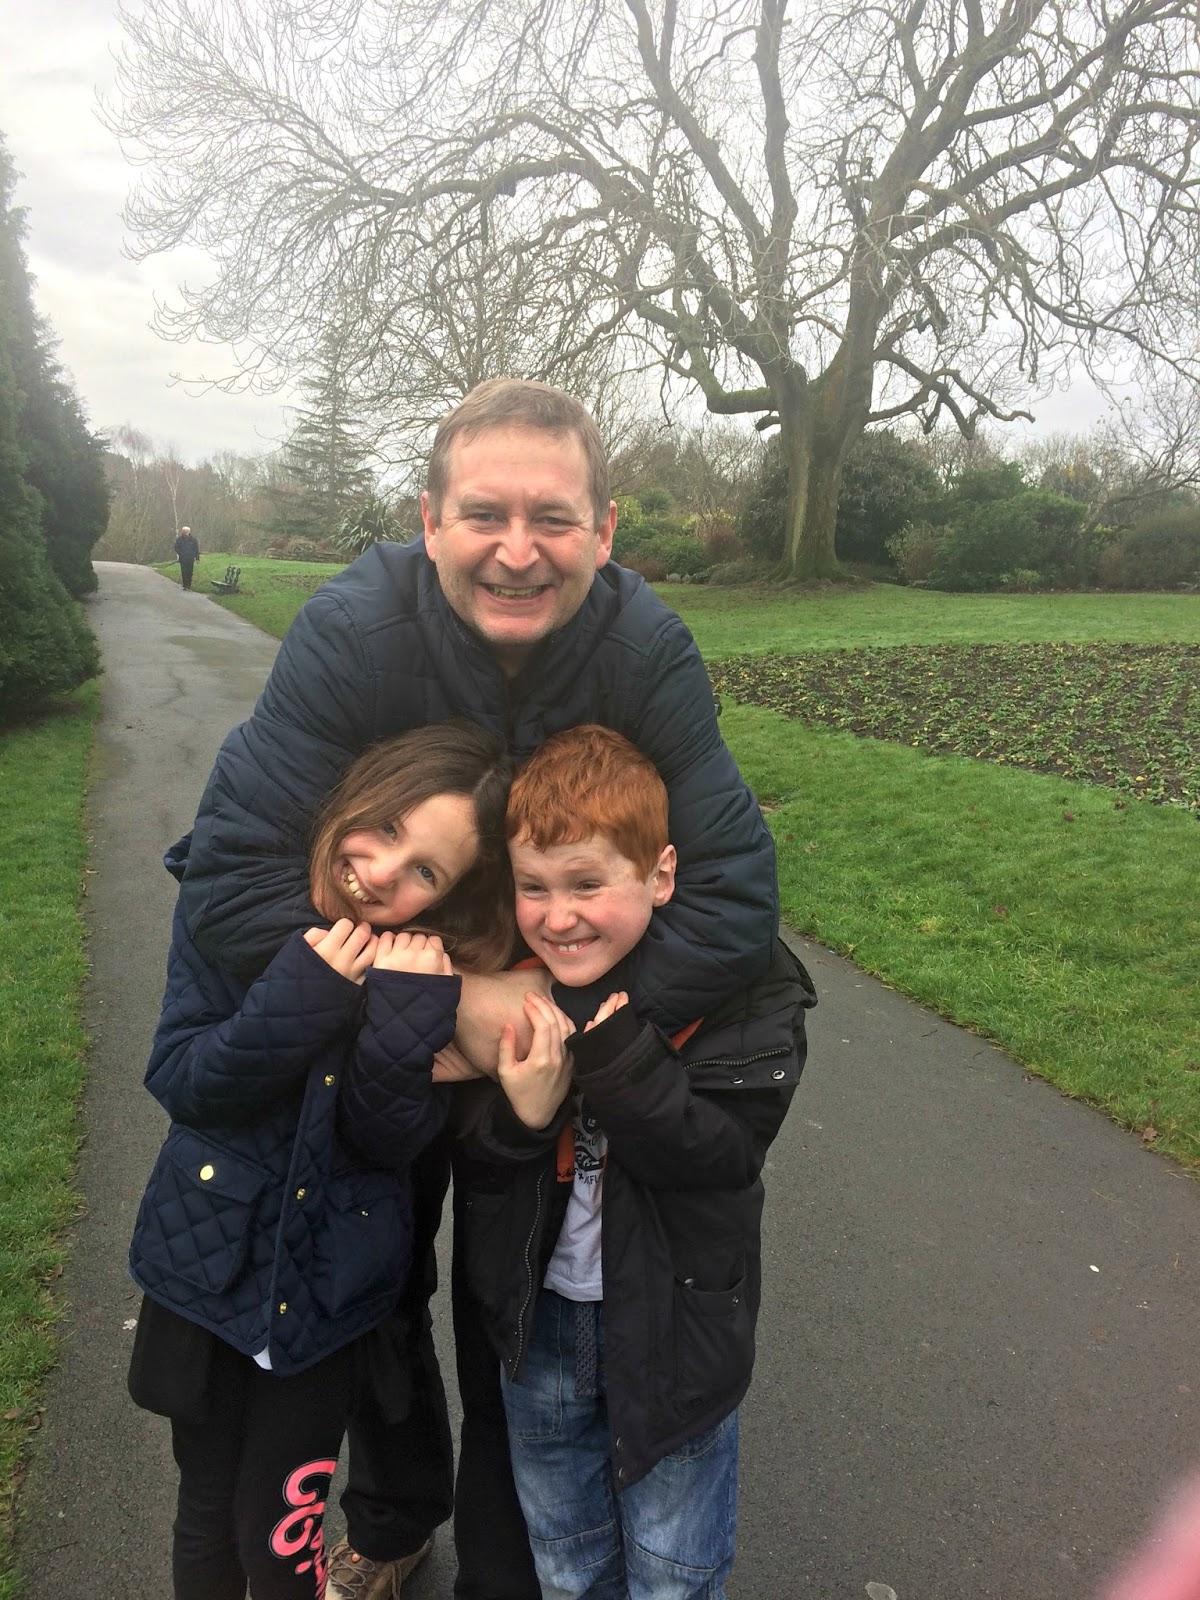 Mat, Caitlin & Ieuan Hobbis in Alexandra Park, Penarth